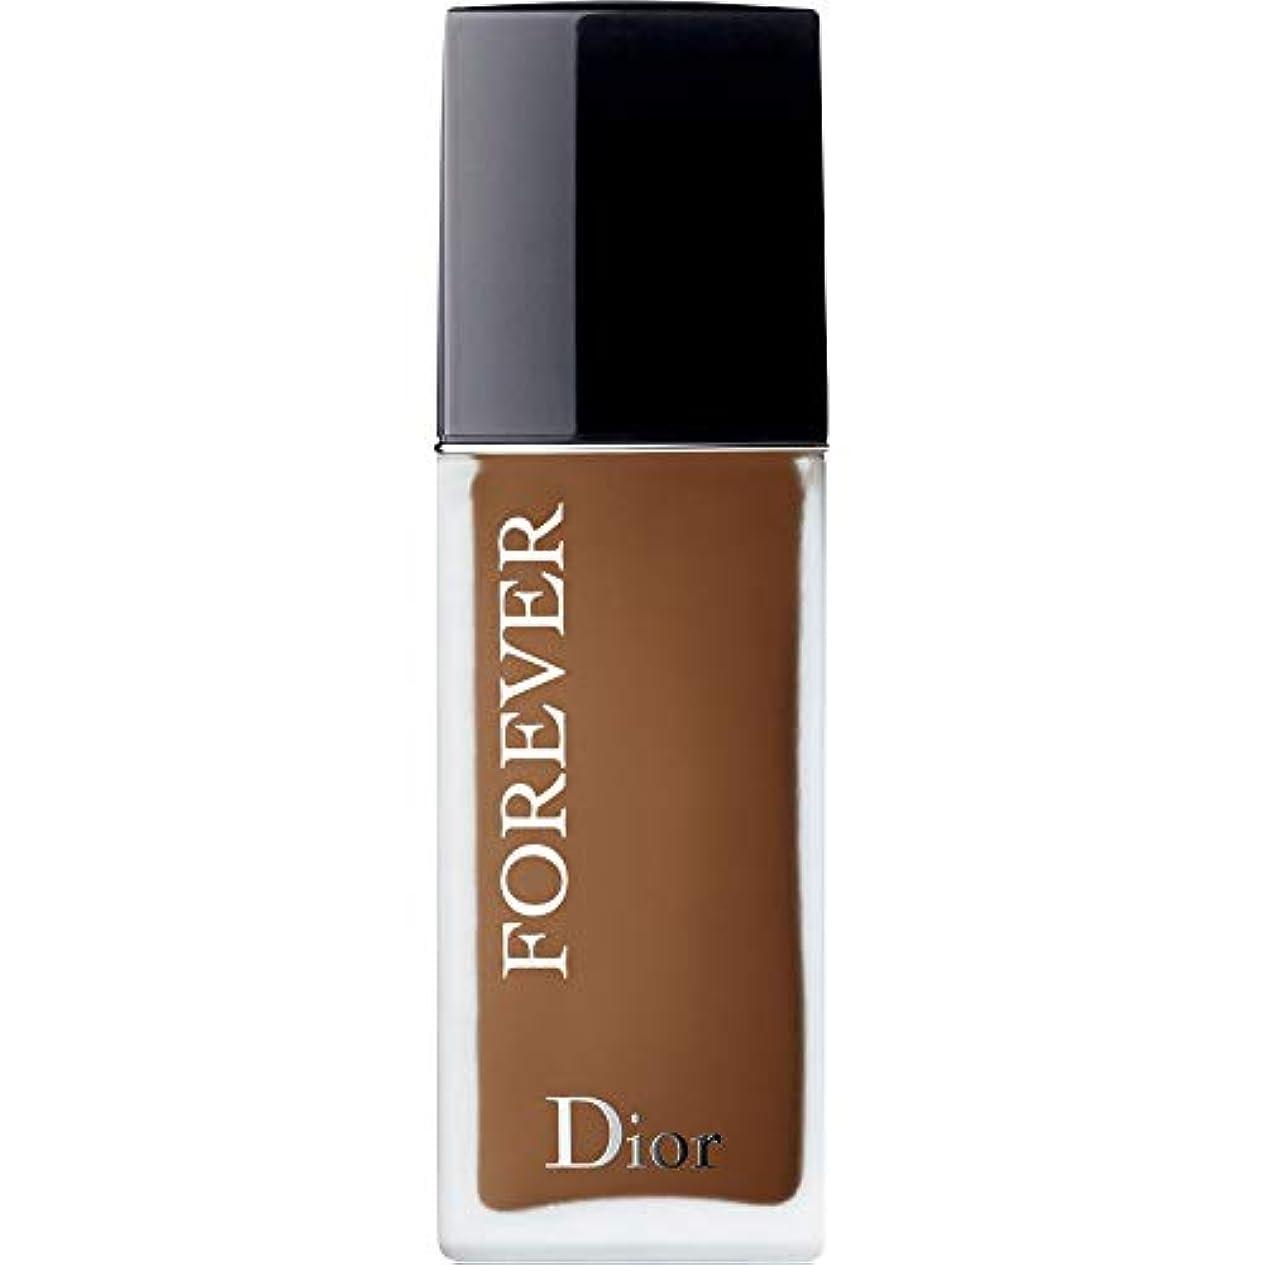 [Dior ] ディオール永遠皮膚思いやりの基盤Spf35 30ミリリットルの7.5N - ニュートラル(つや消し) - DIOR Forever Skin-Caring Foundation SPF35 30ml 7.5N...